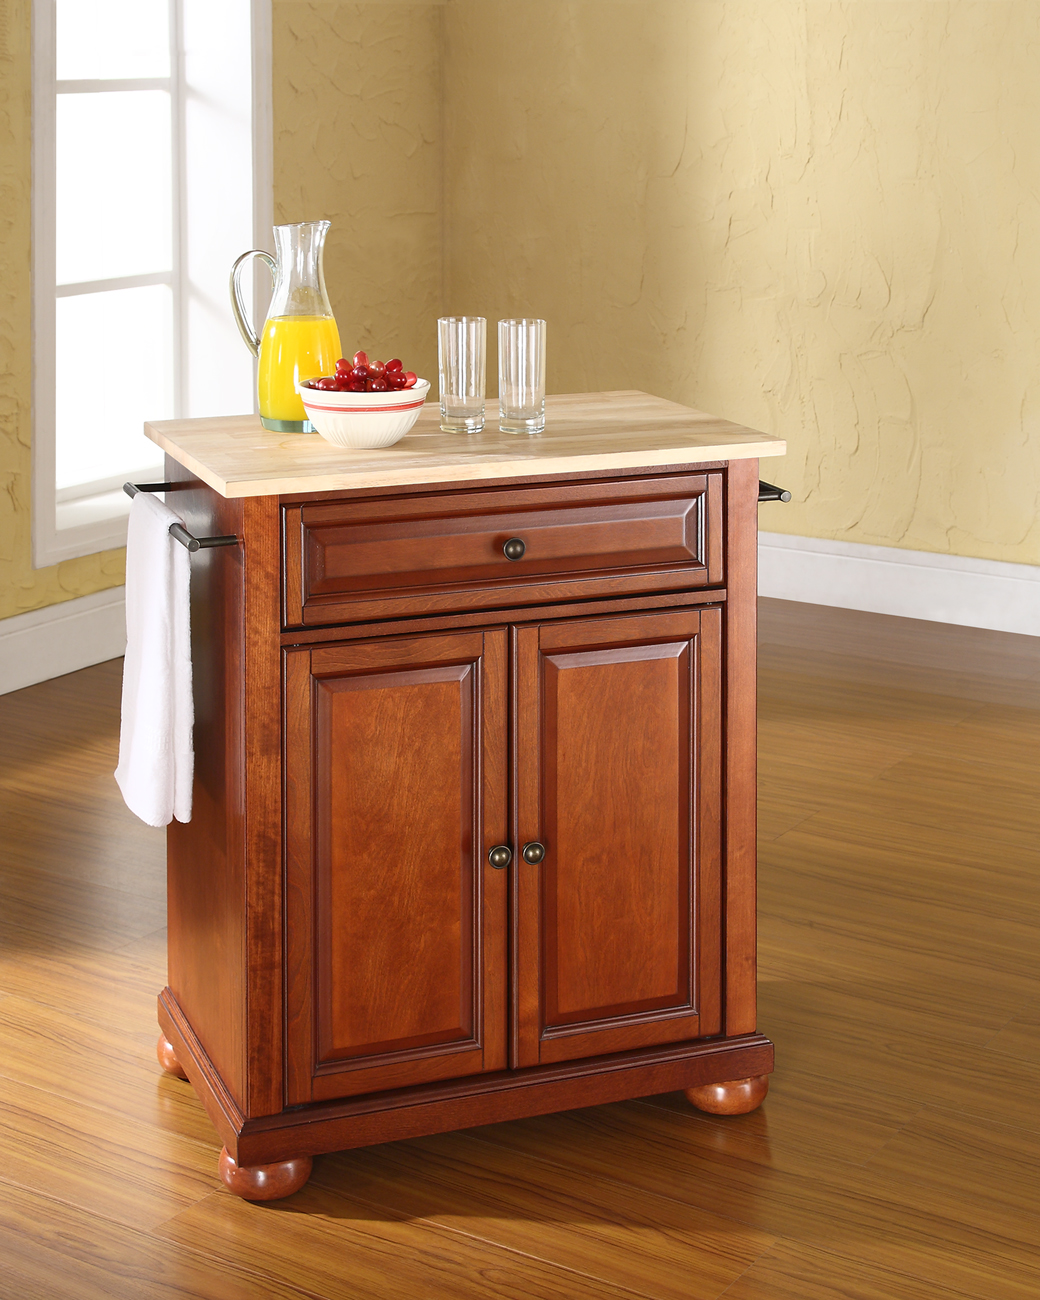 elegant oak kitchen cabi furniture home interior design picture